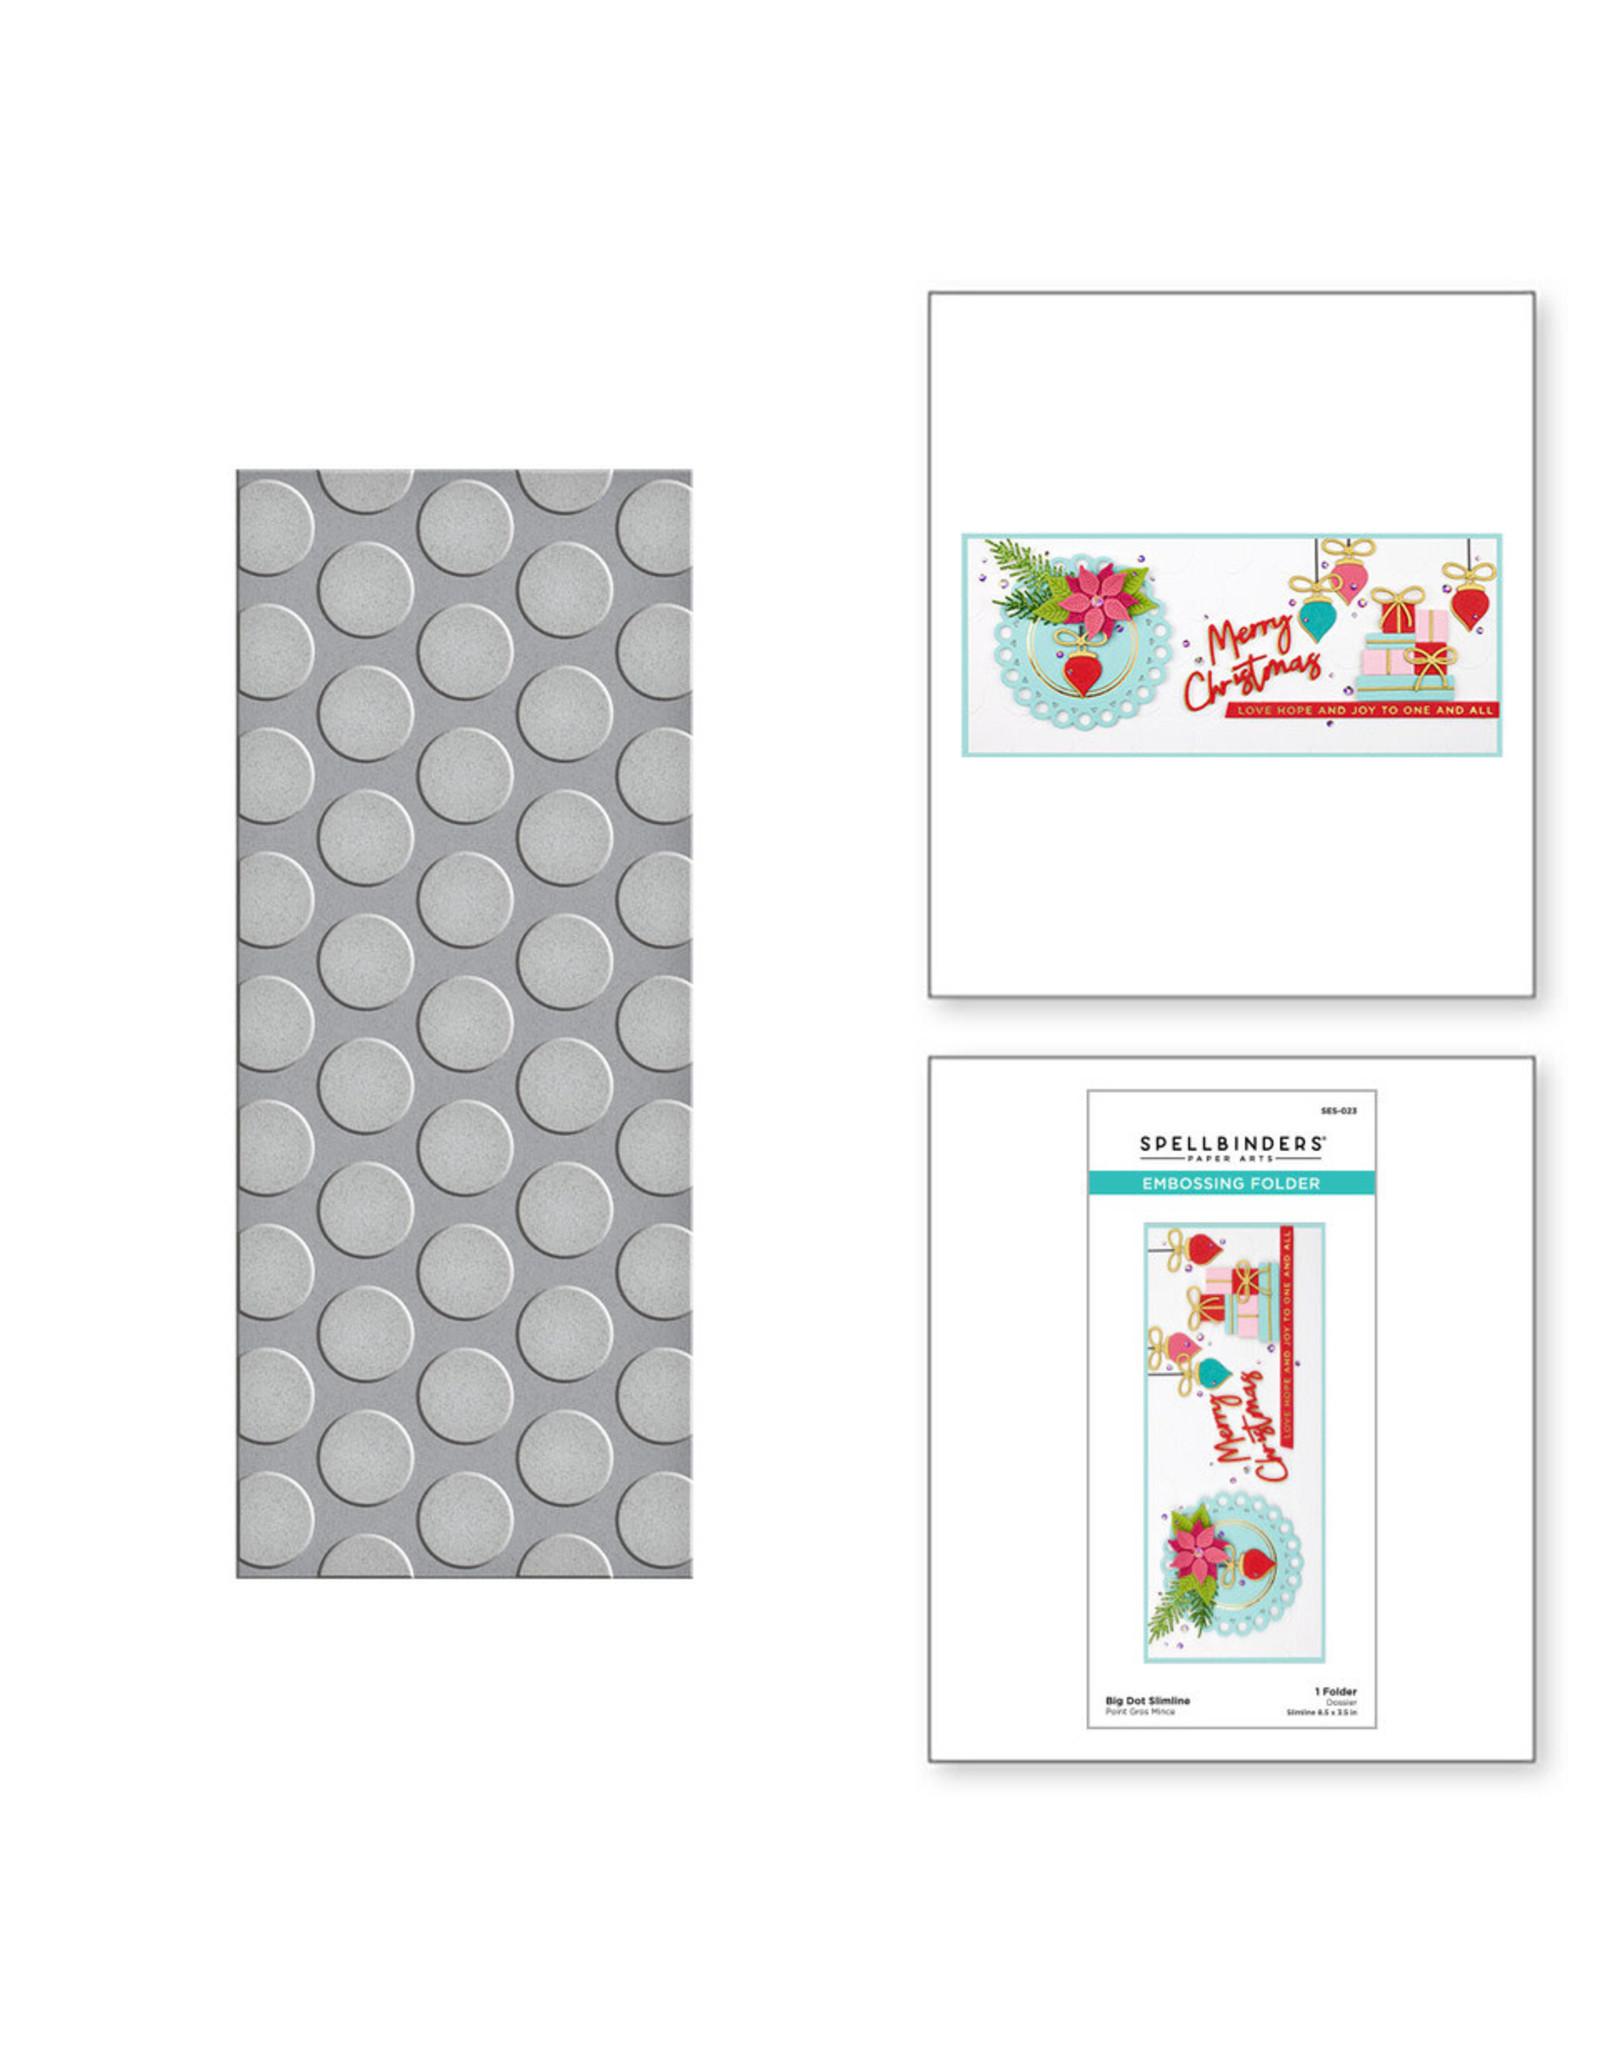 Spellbinders Big Dot Slimline Embossing Folder